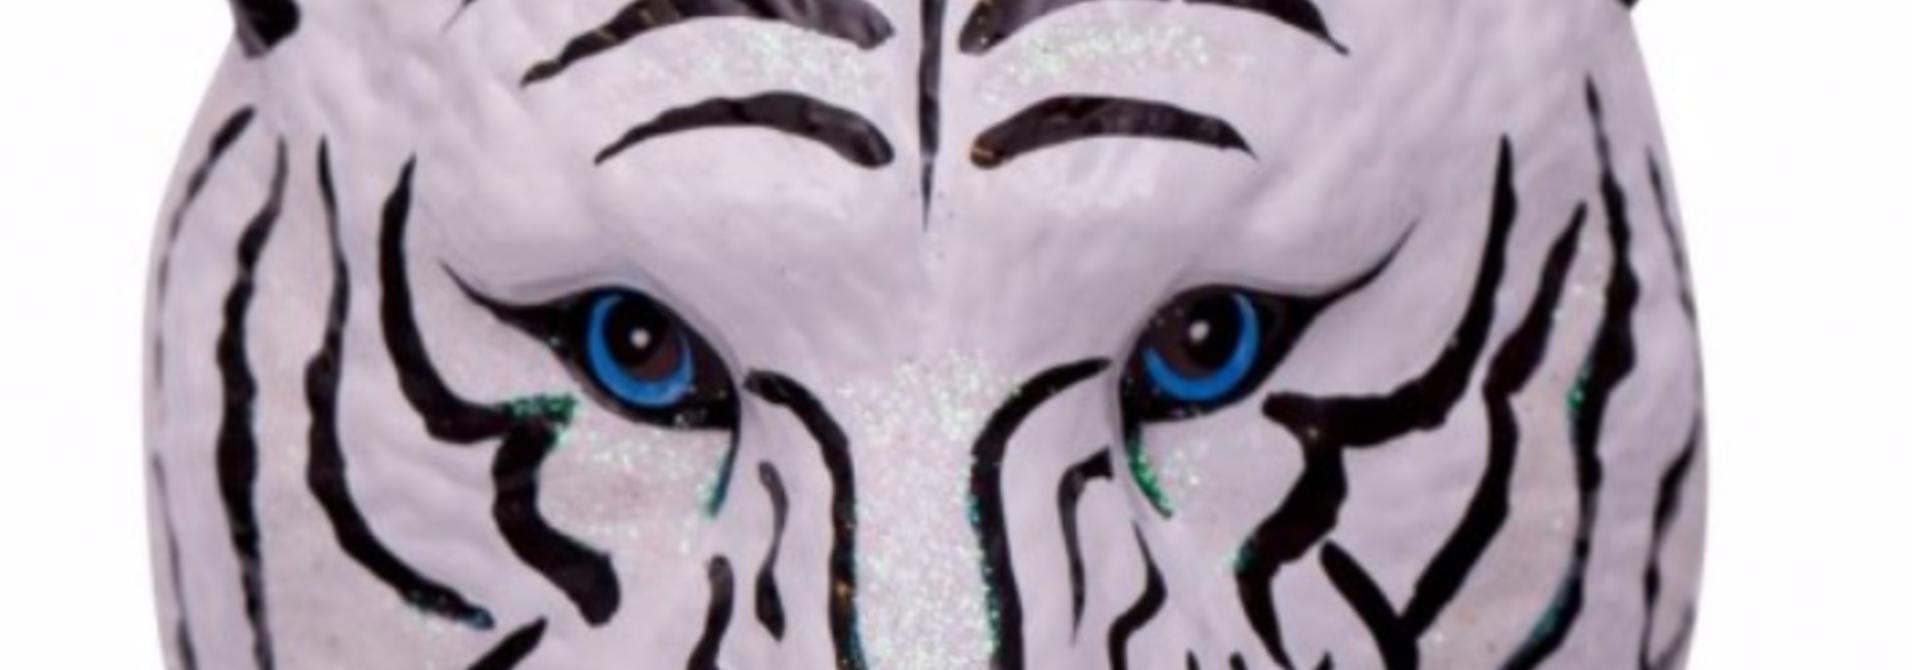 Kersthanger white/black tiger head